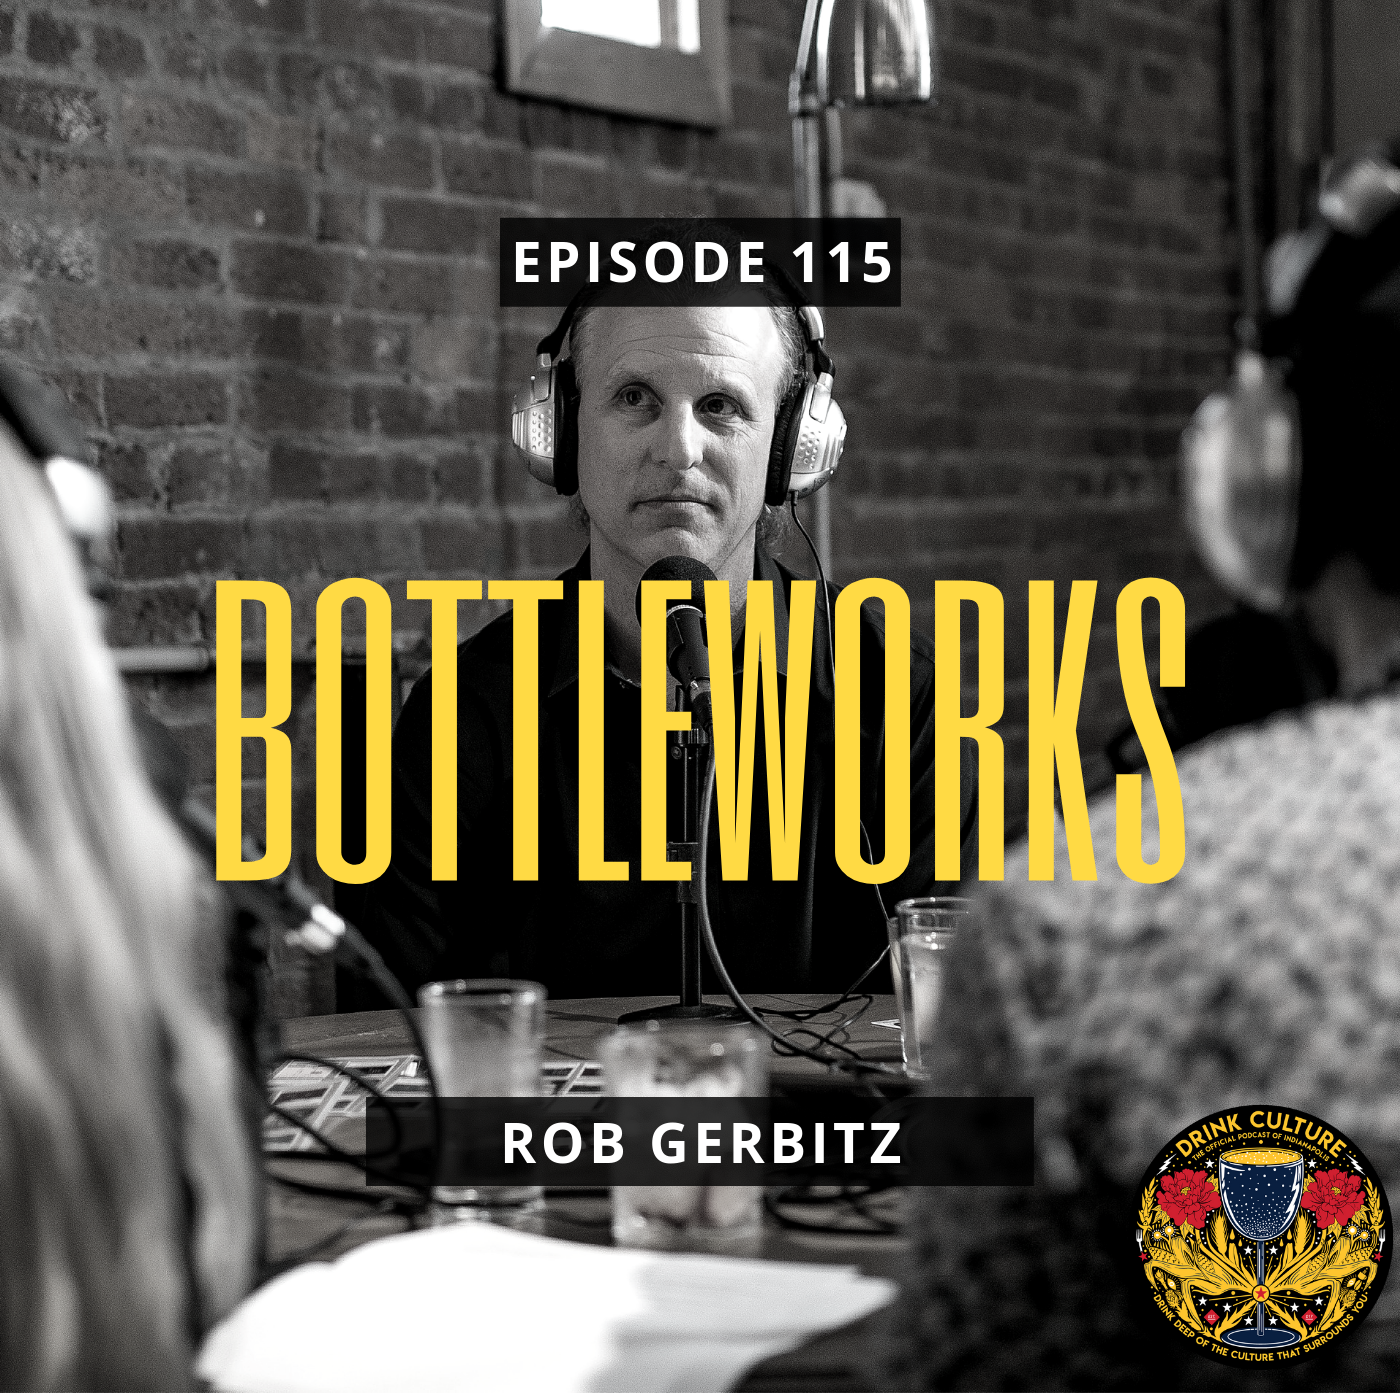 Episode 115: Bottleworks, Rob Gerbitz -